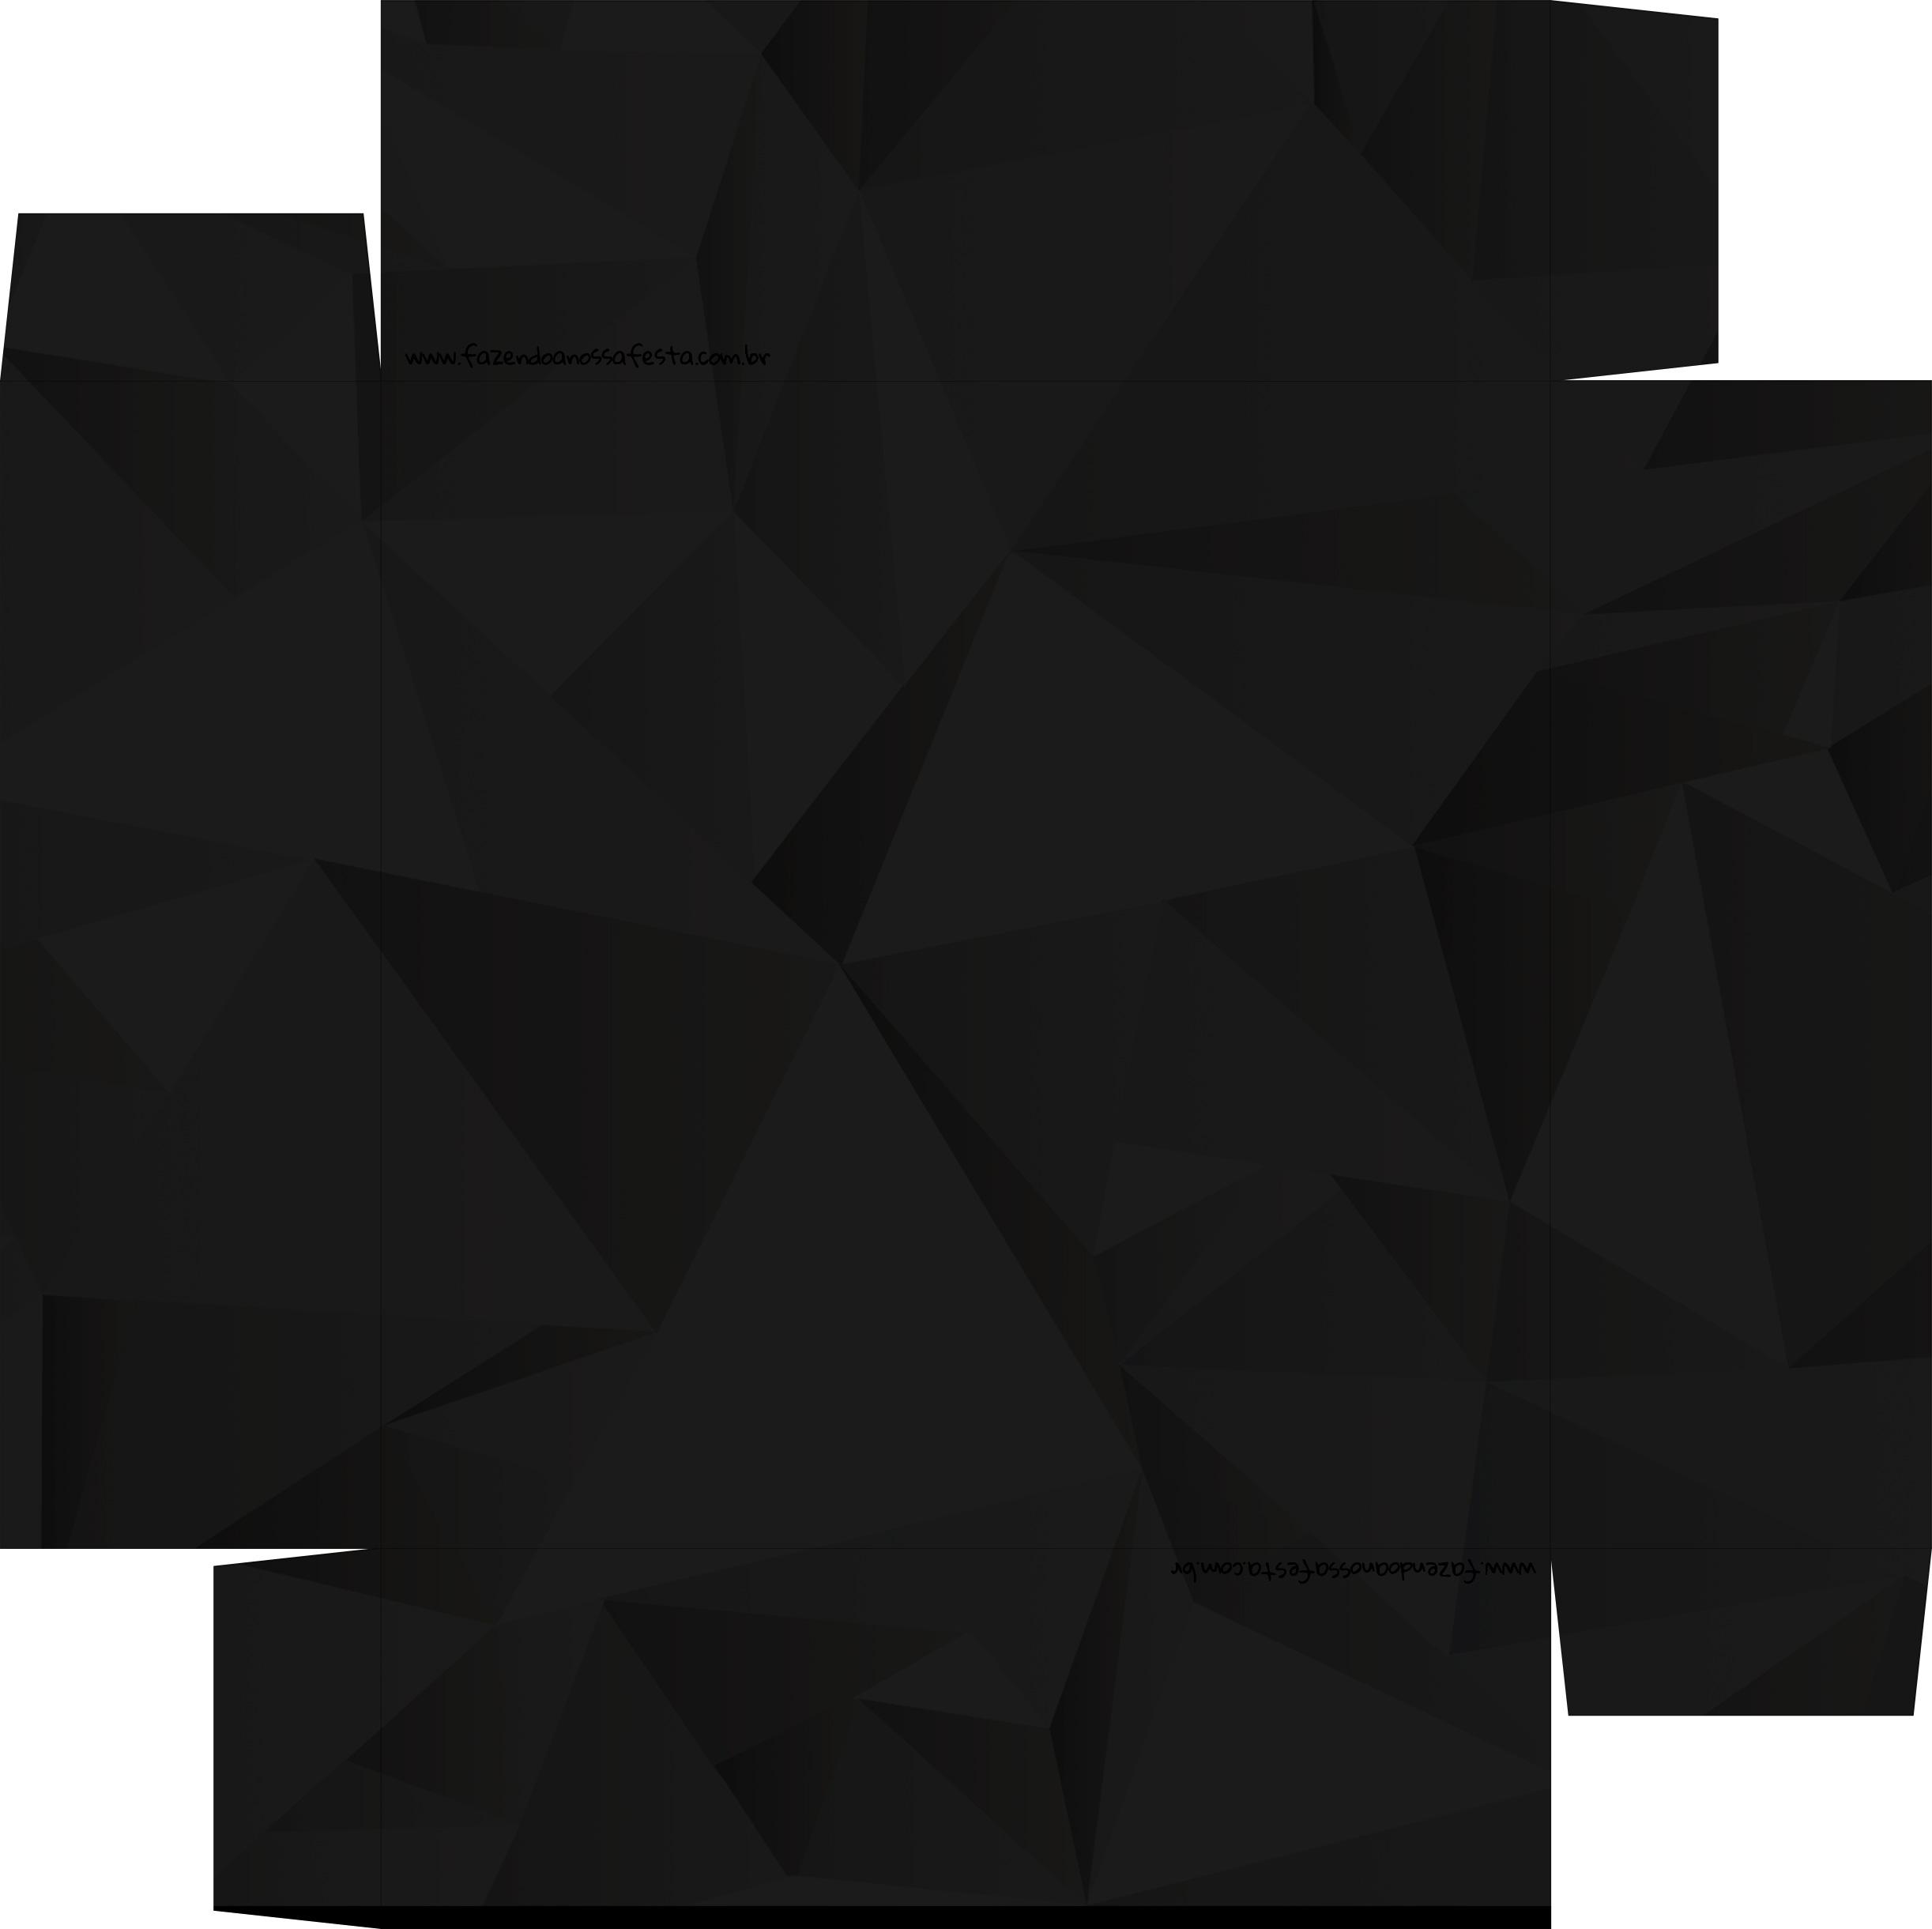 Caixa de BomBom Lembrancinha Ano Novo Diamante Negro Base